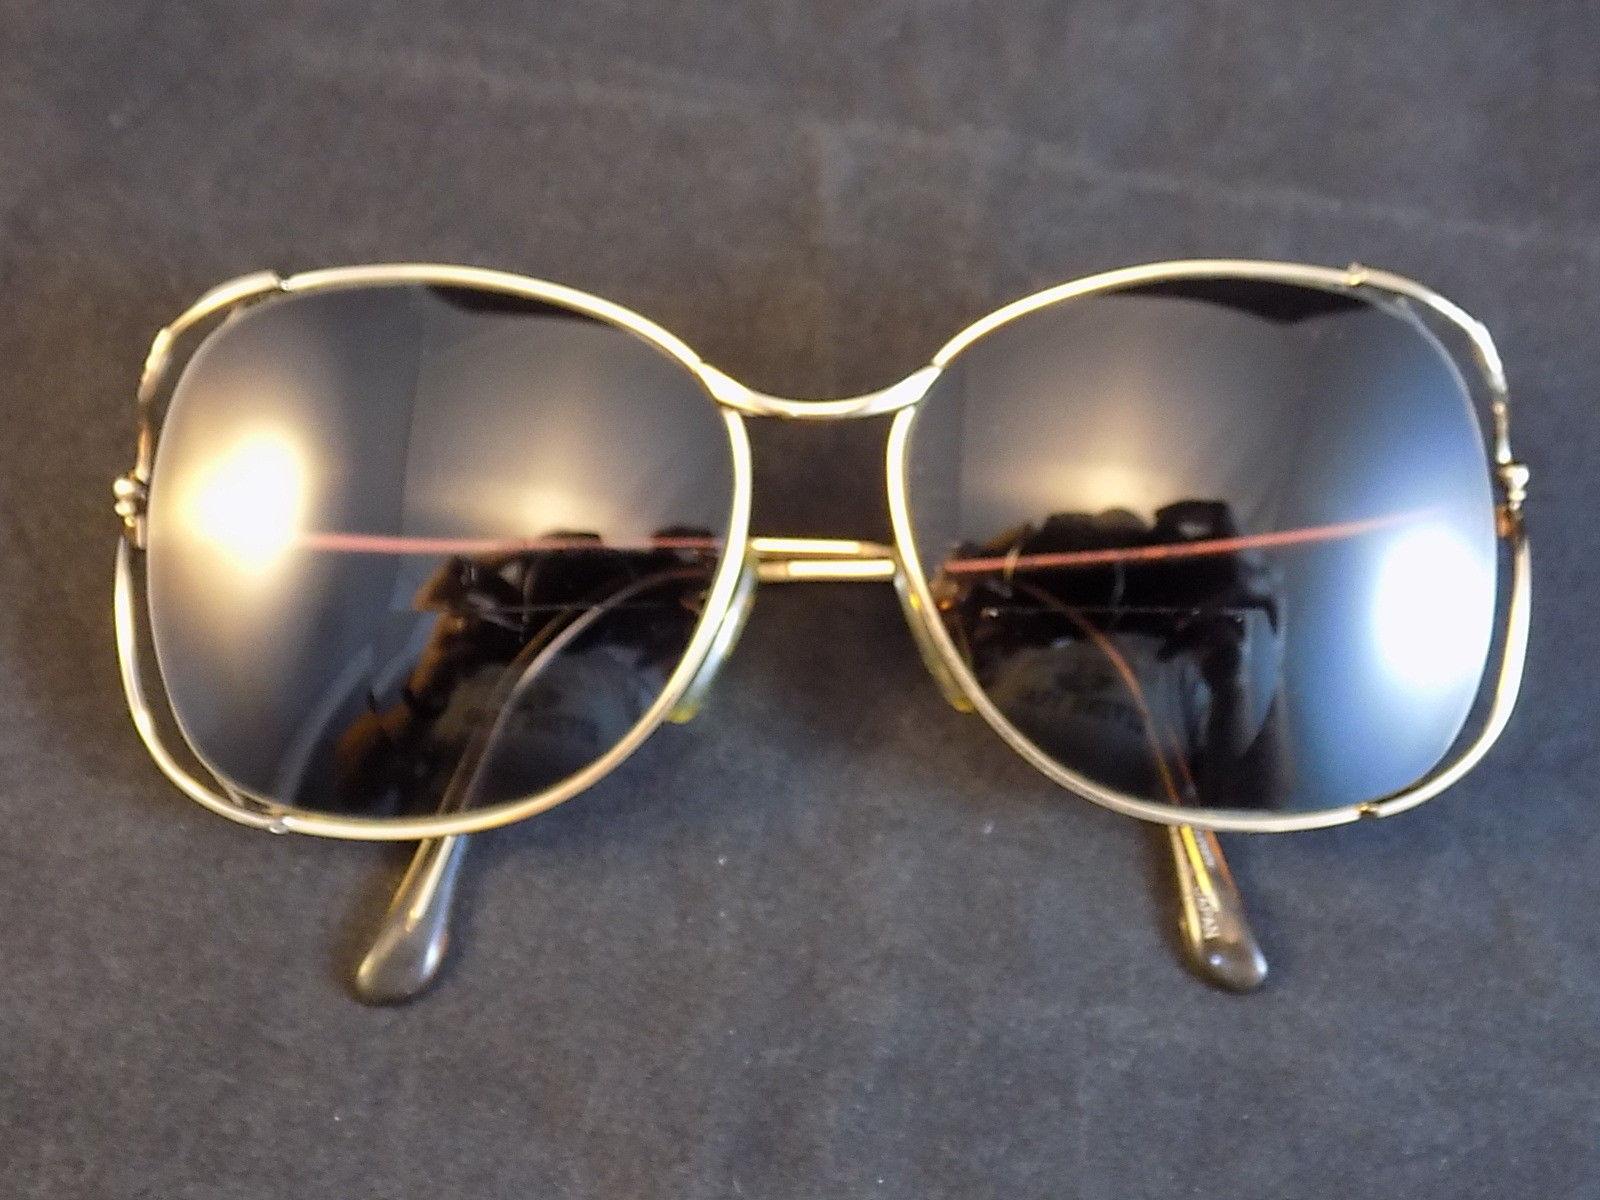 9e5952207c S l1600. S l1600. Previous. GLASSES FRAMES WOMEN S Swank Optical 135 Tulip  965 800 56-16 Gold HIPSTER Frames